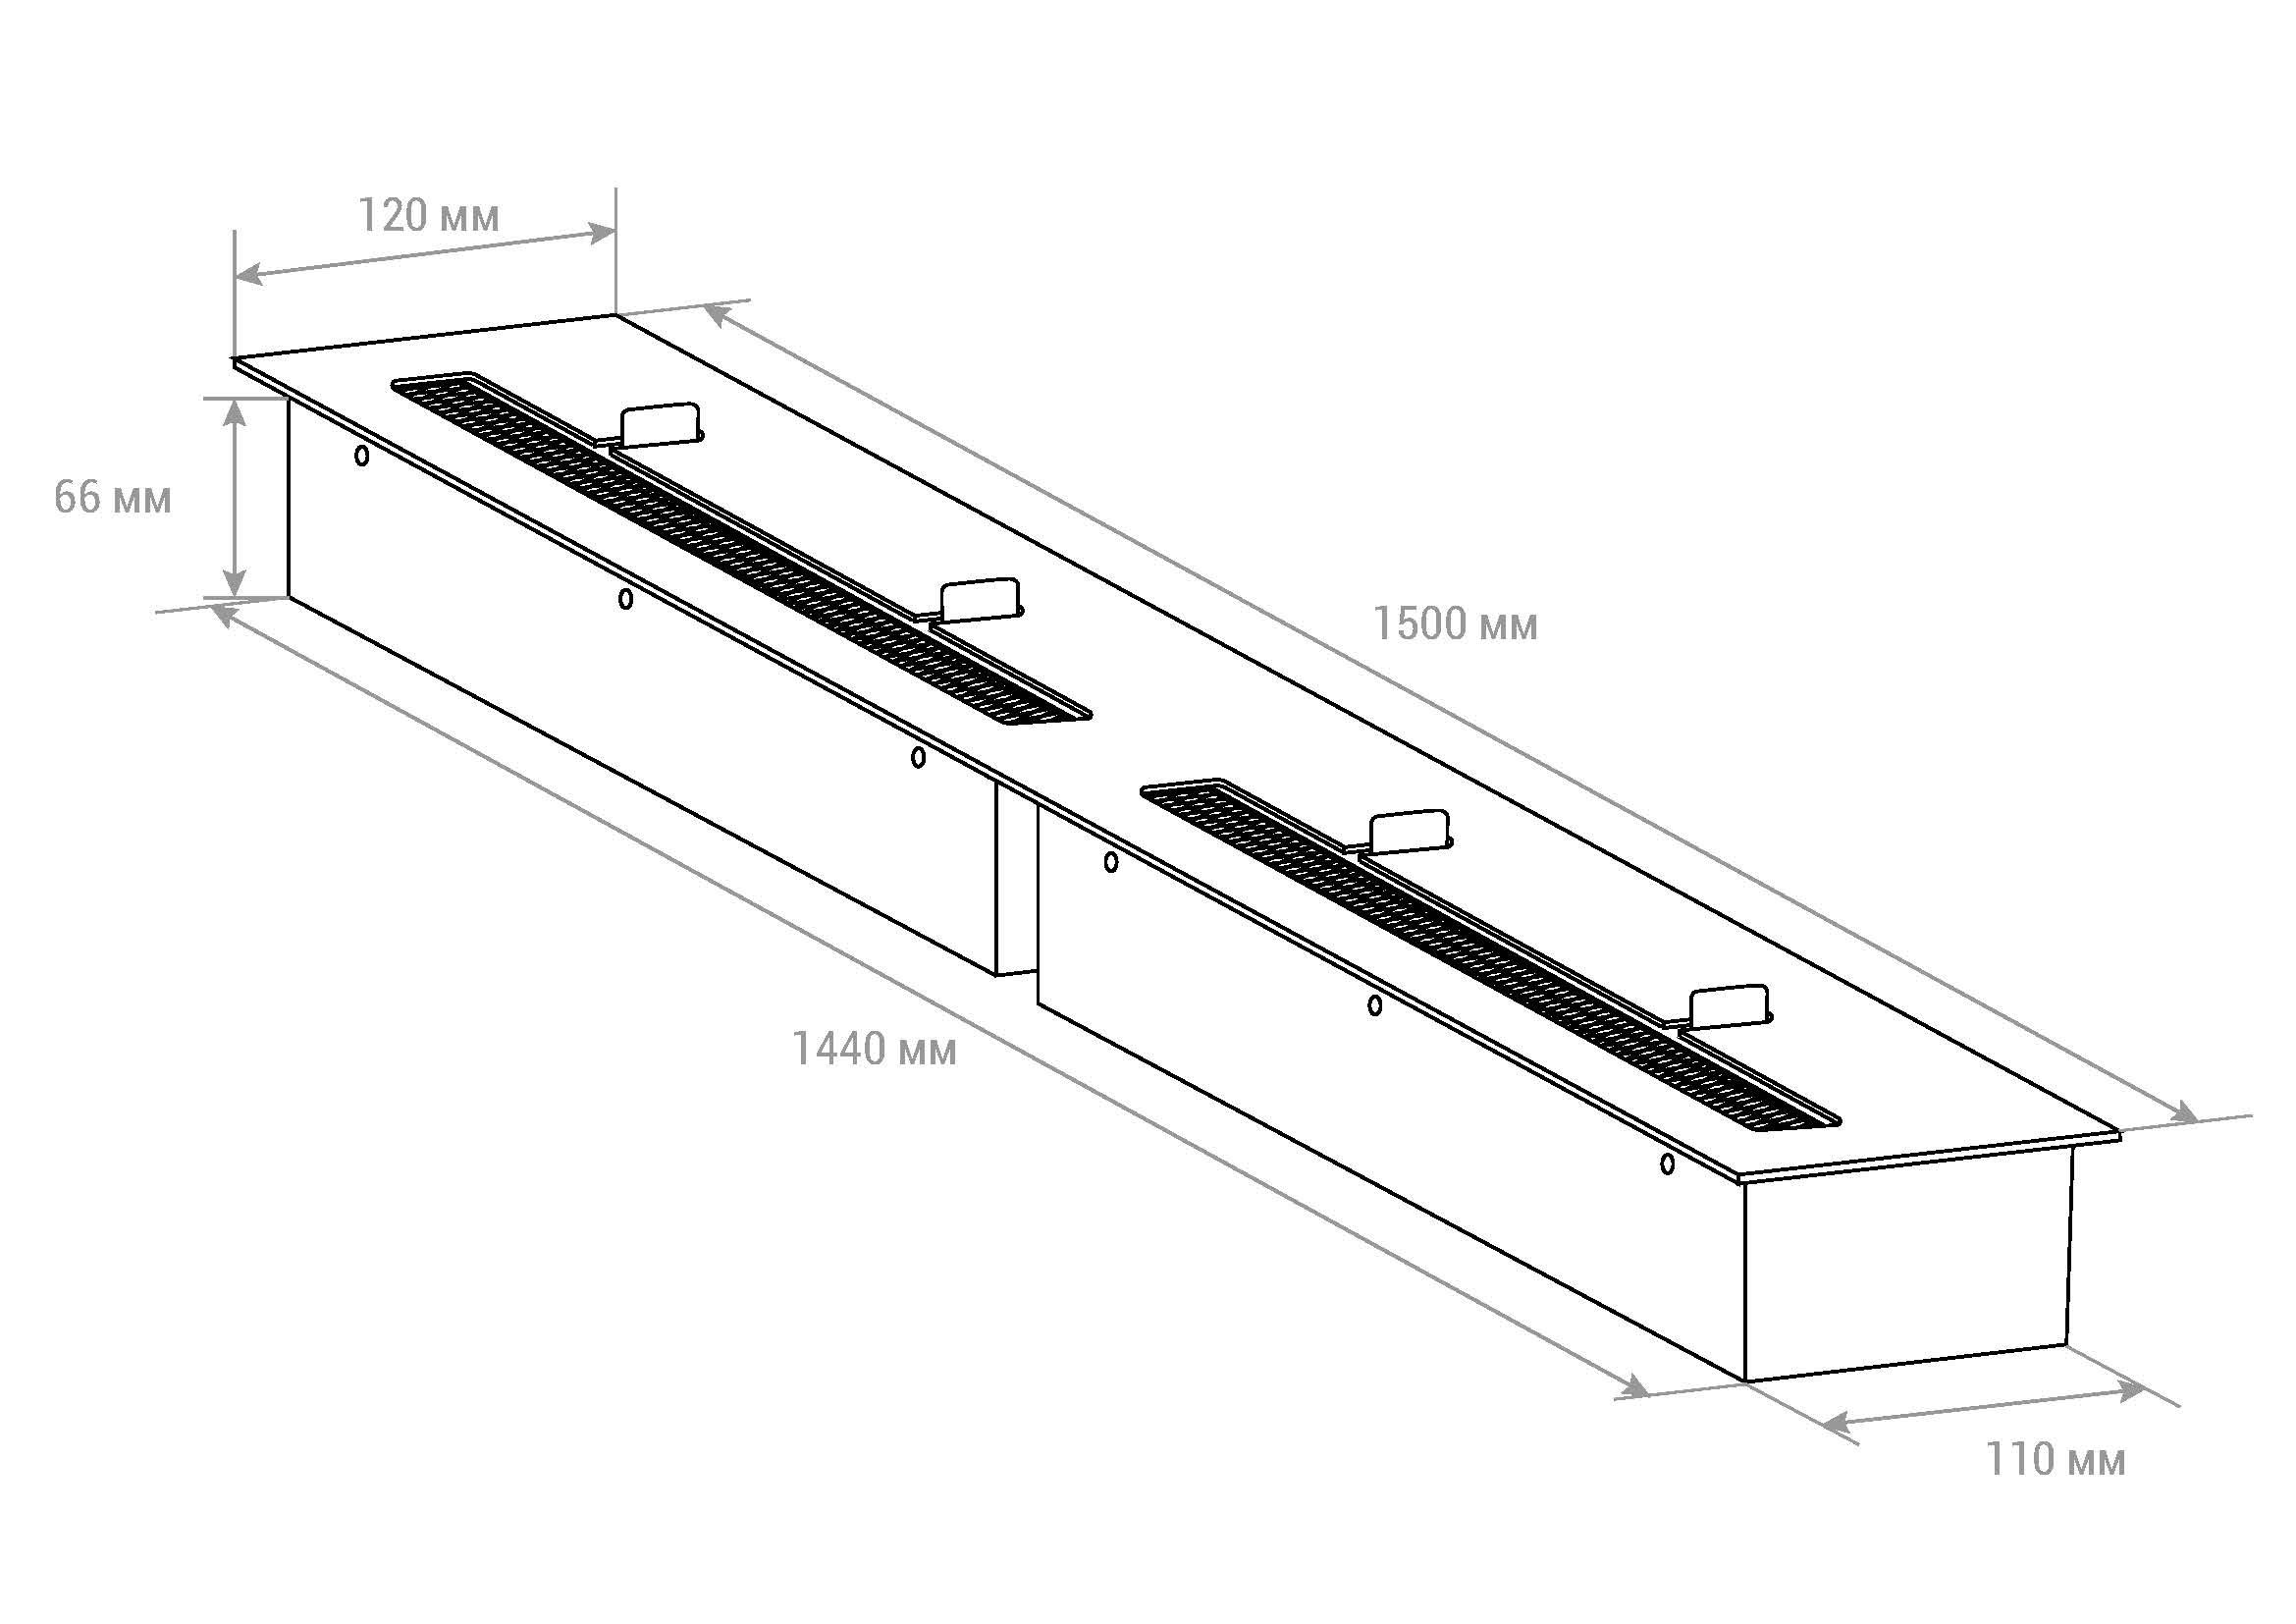 Схема топливного блока Lux Fire 1500 M